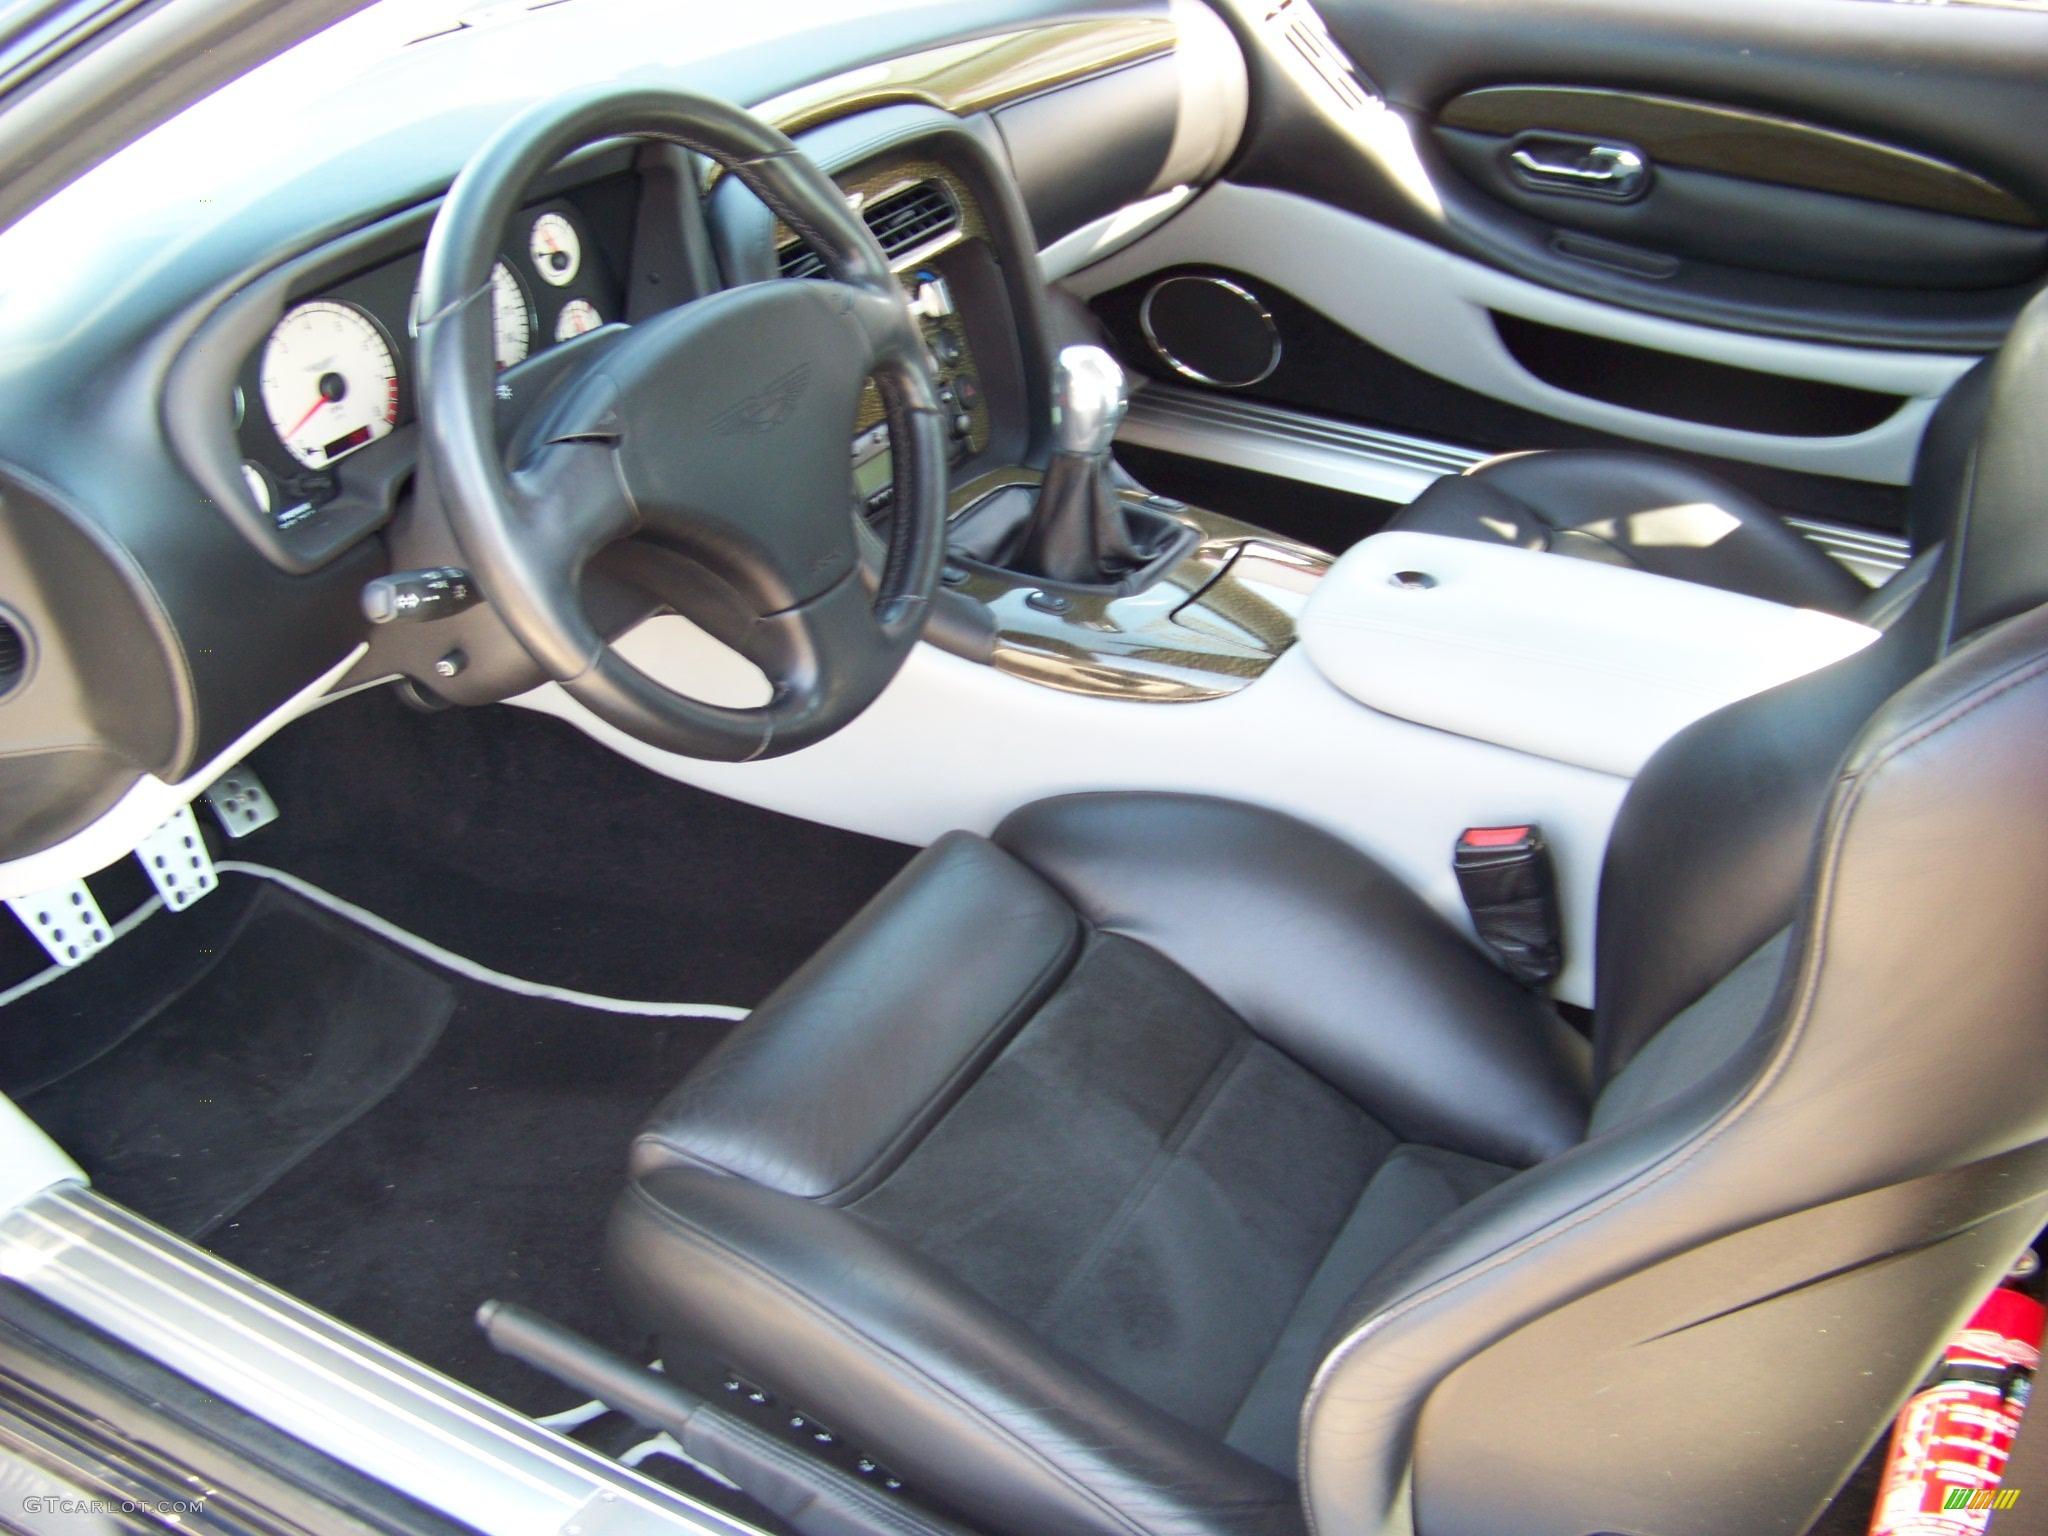 2003 Grey Aston Martin DB7 Vantage GT Coupe 220520 Photo